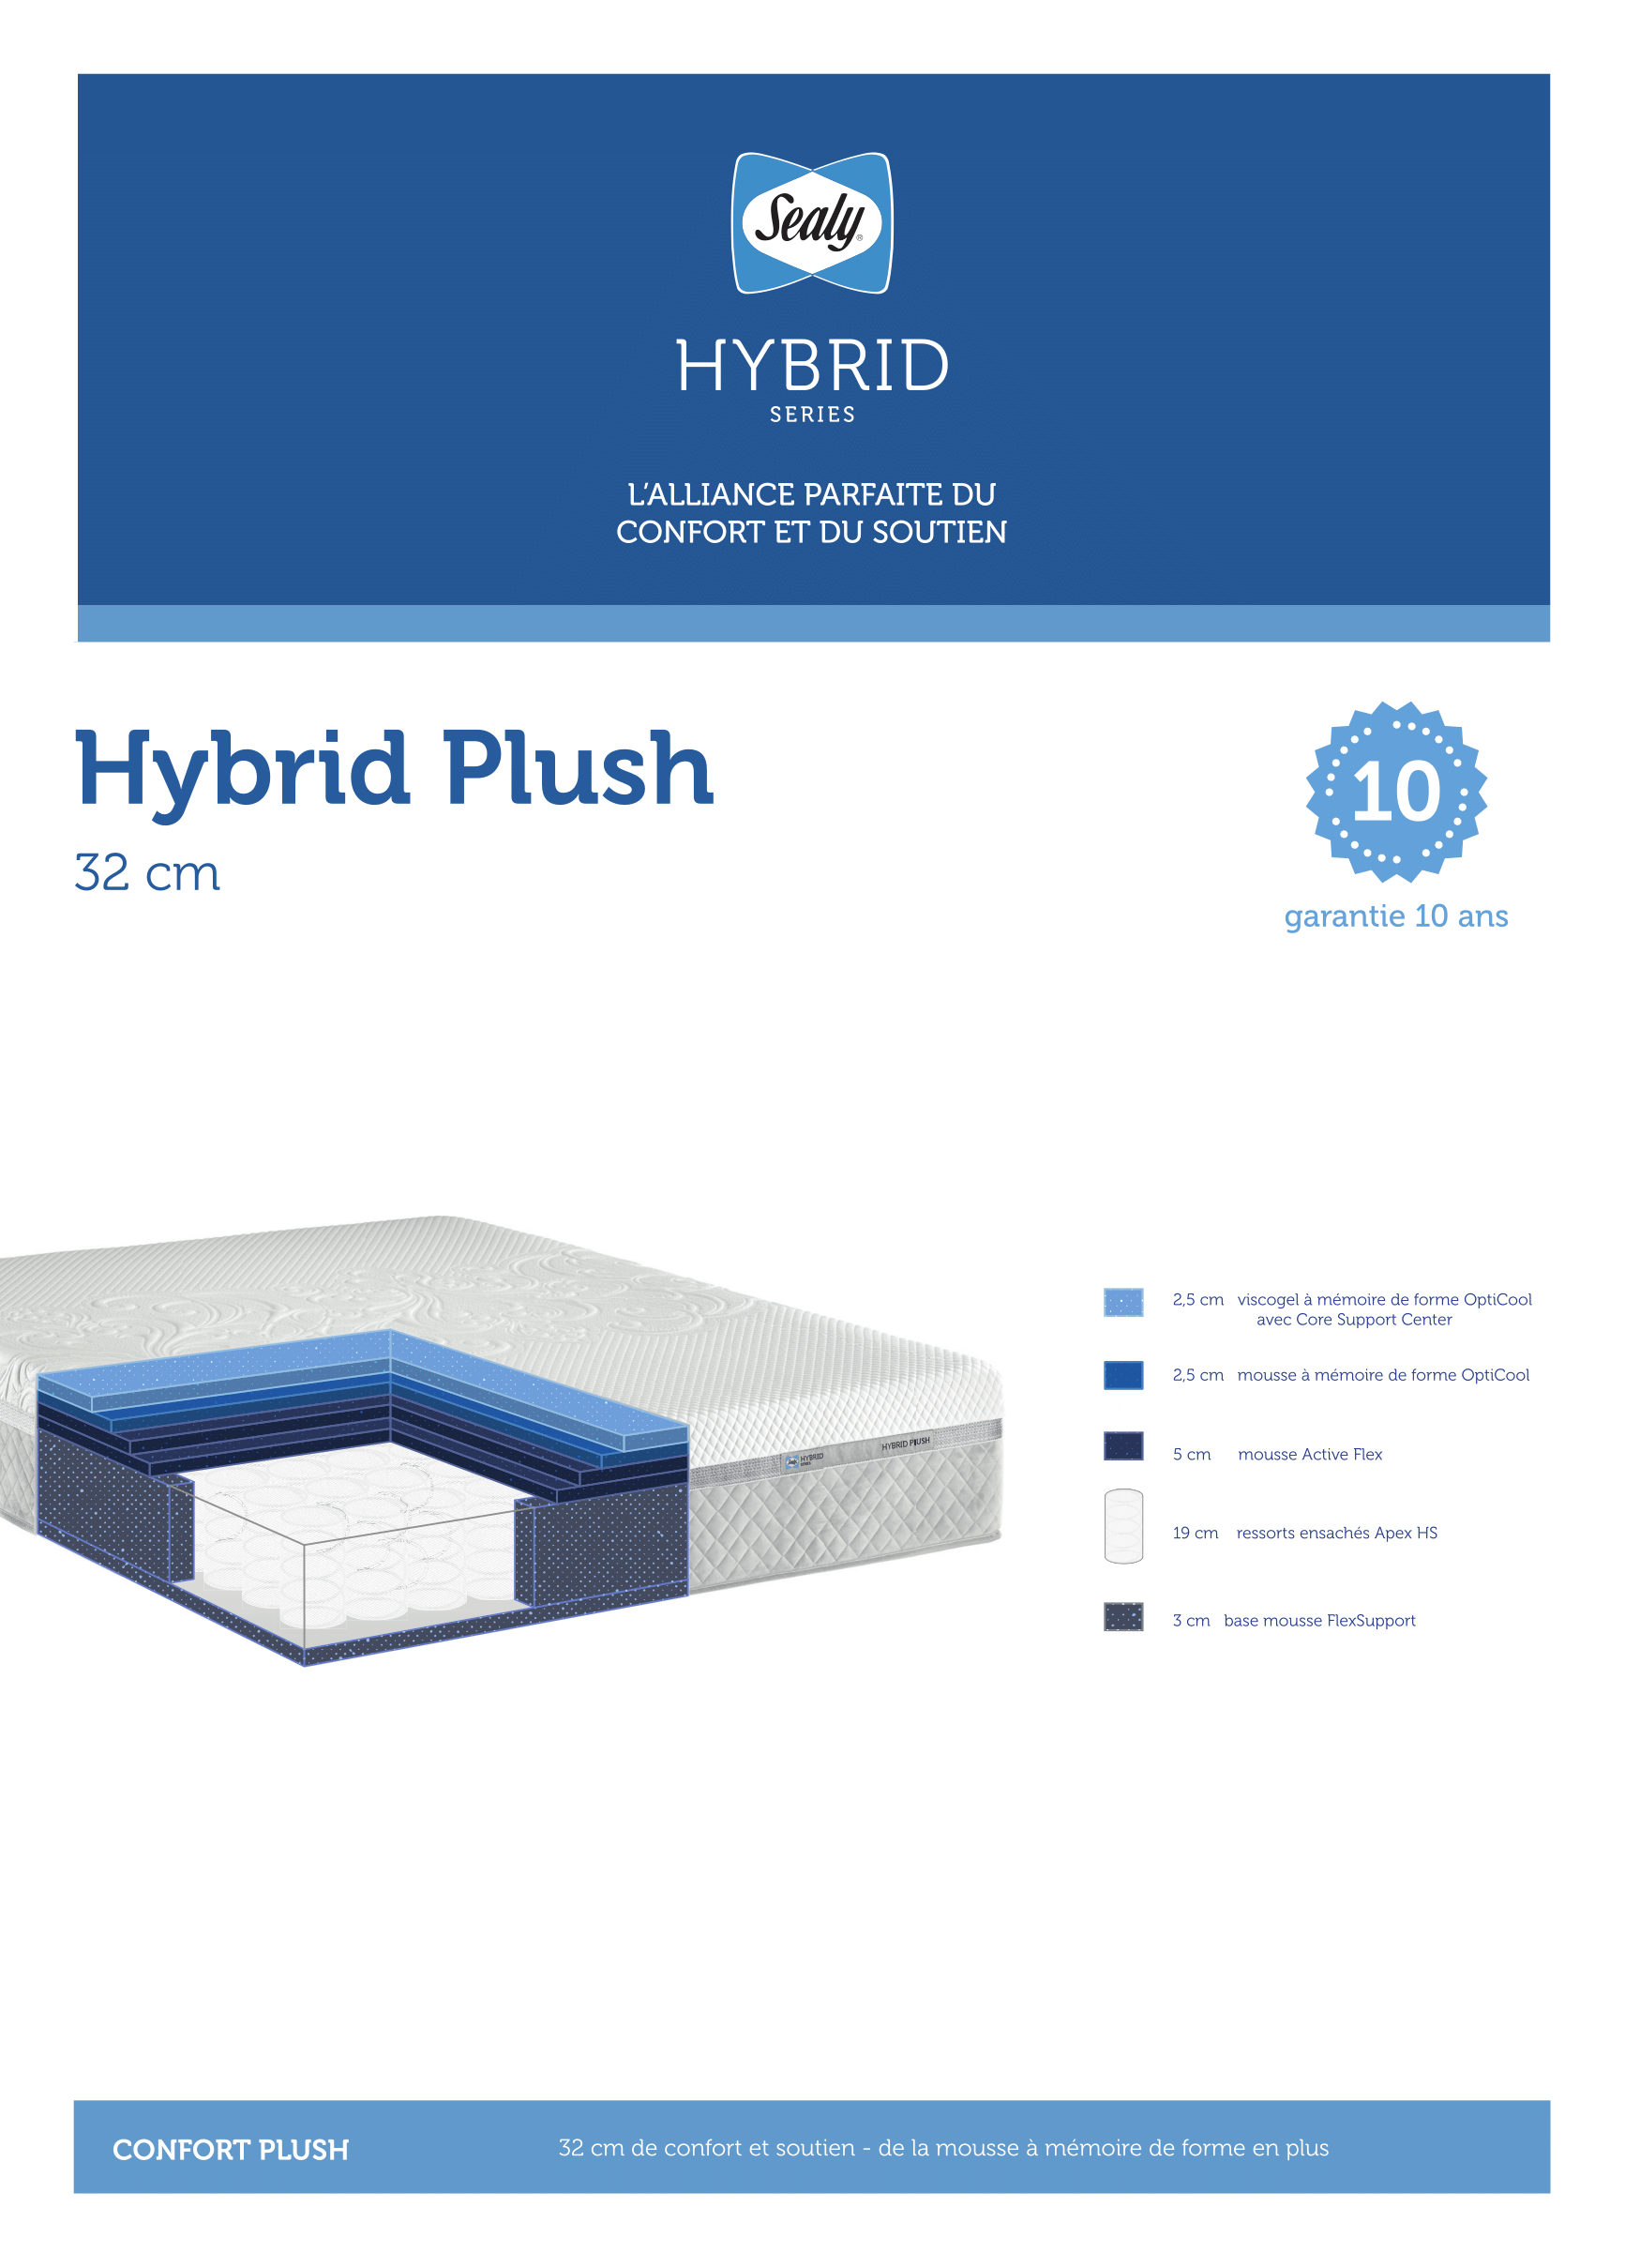 FP_Hybrid_Plush_2016-2